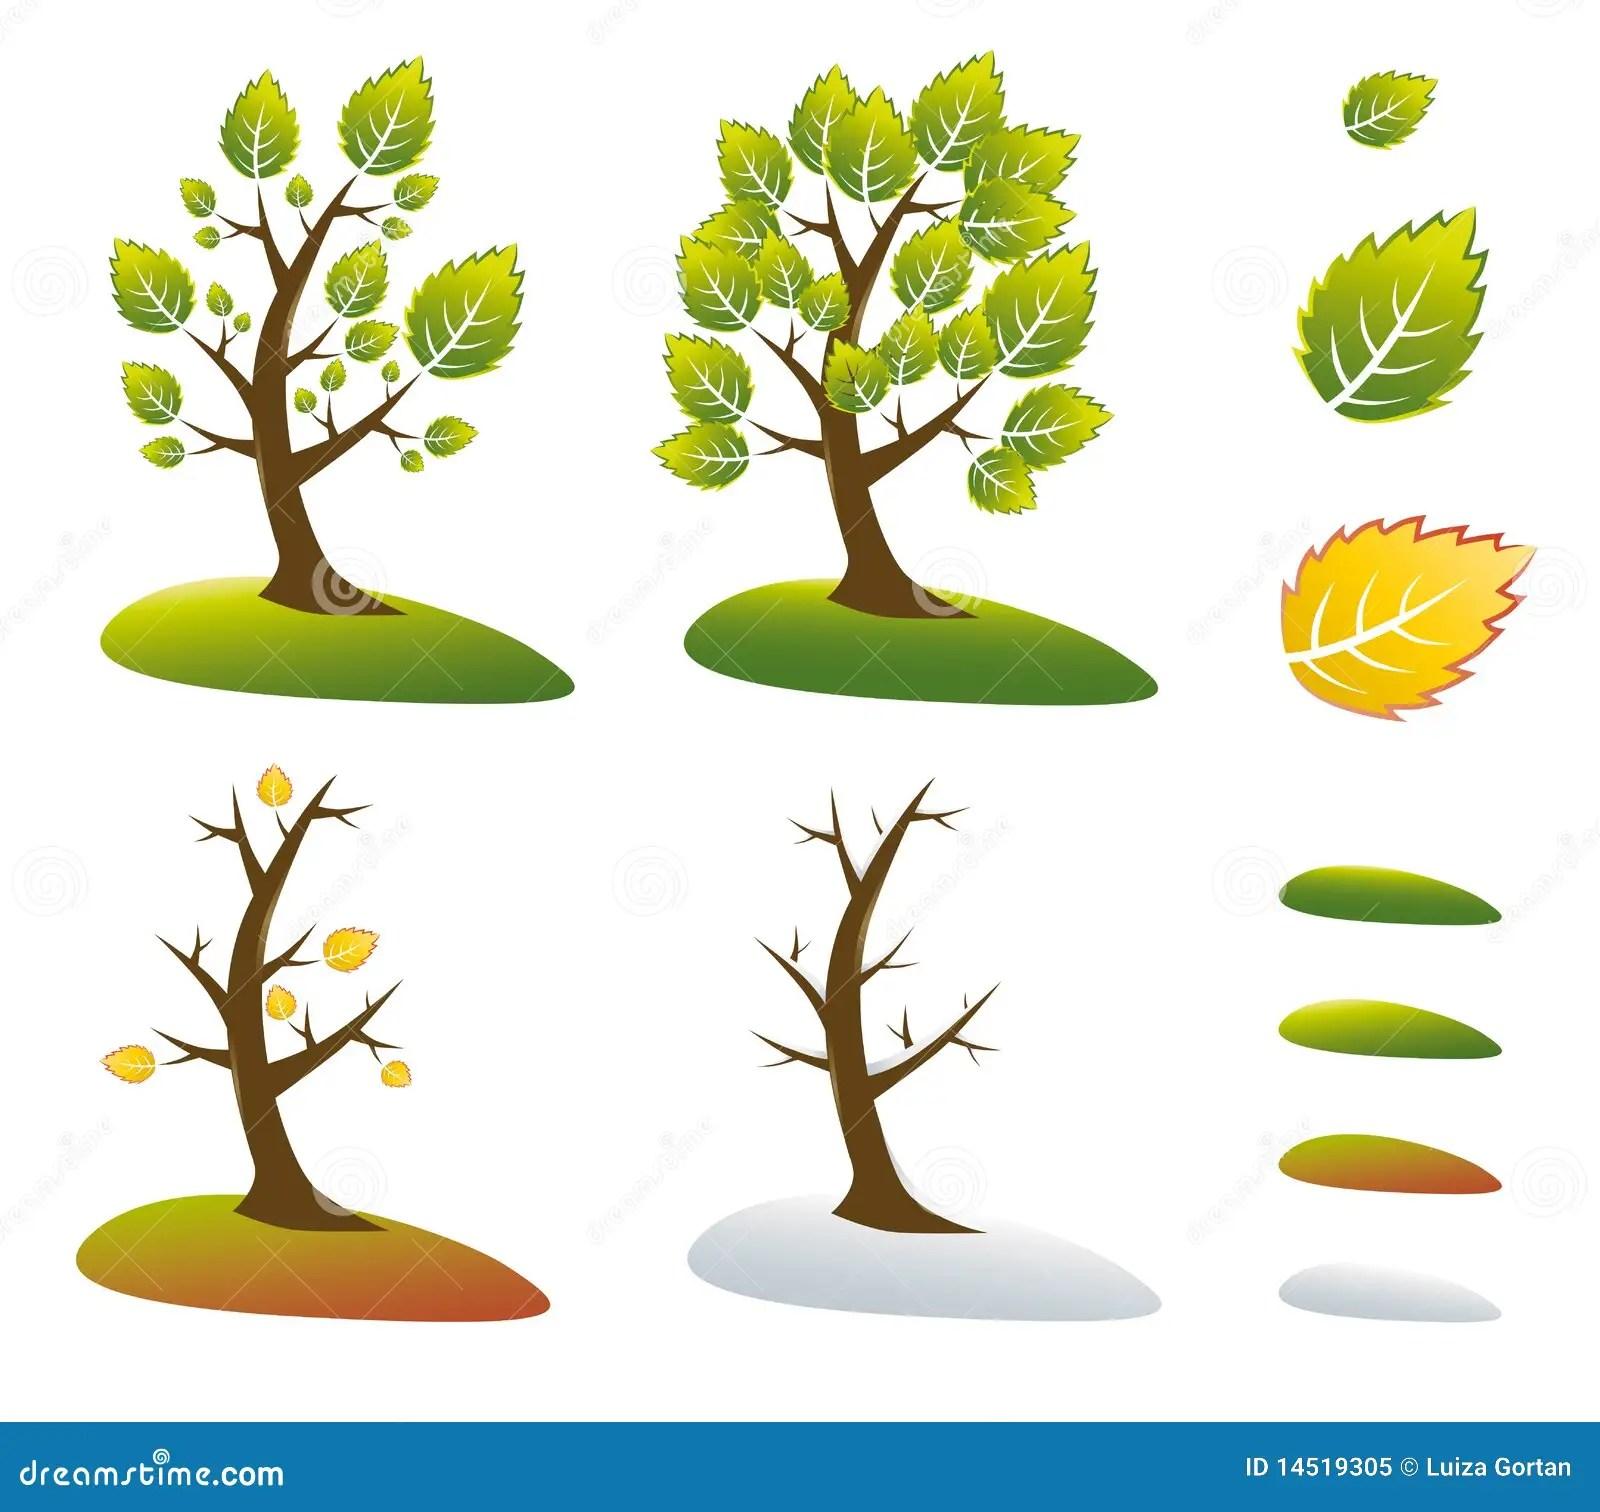 Season Tree Symbols Vector Illustration Stock Vector